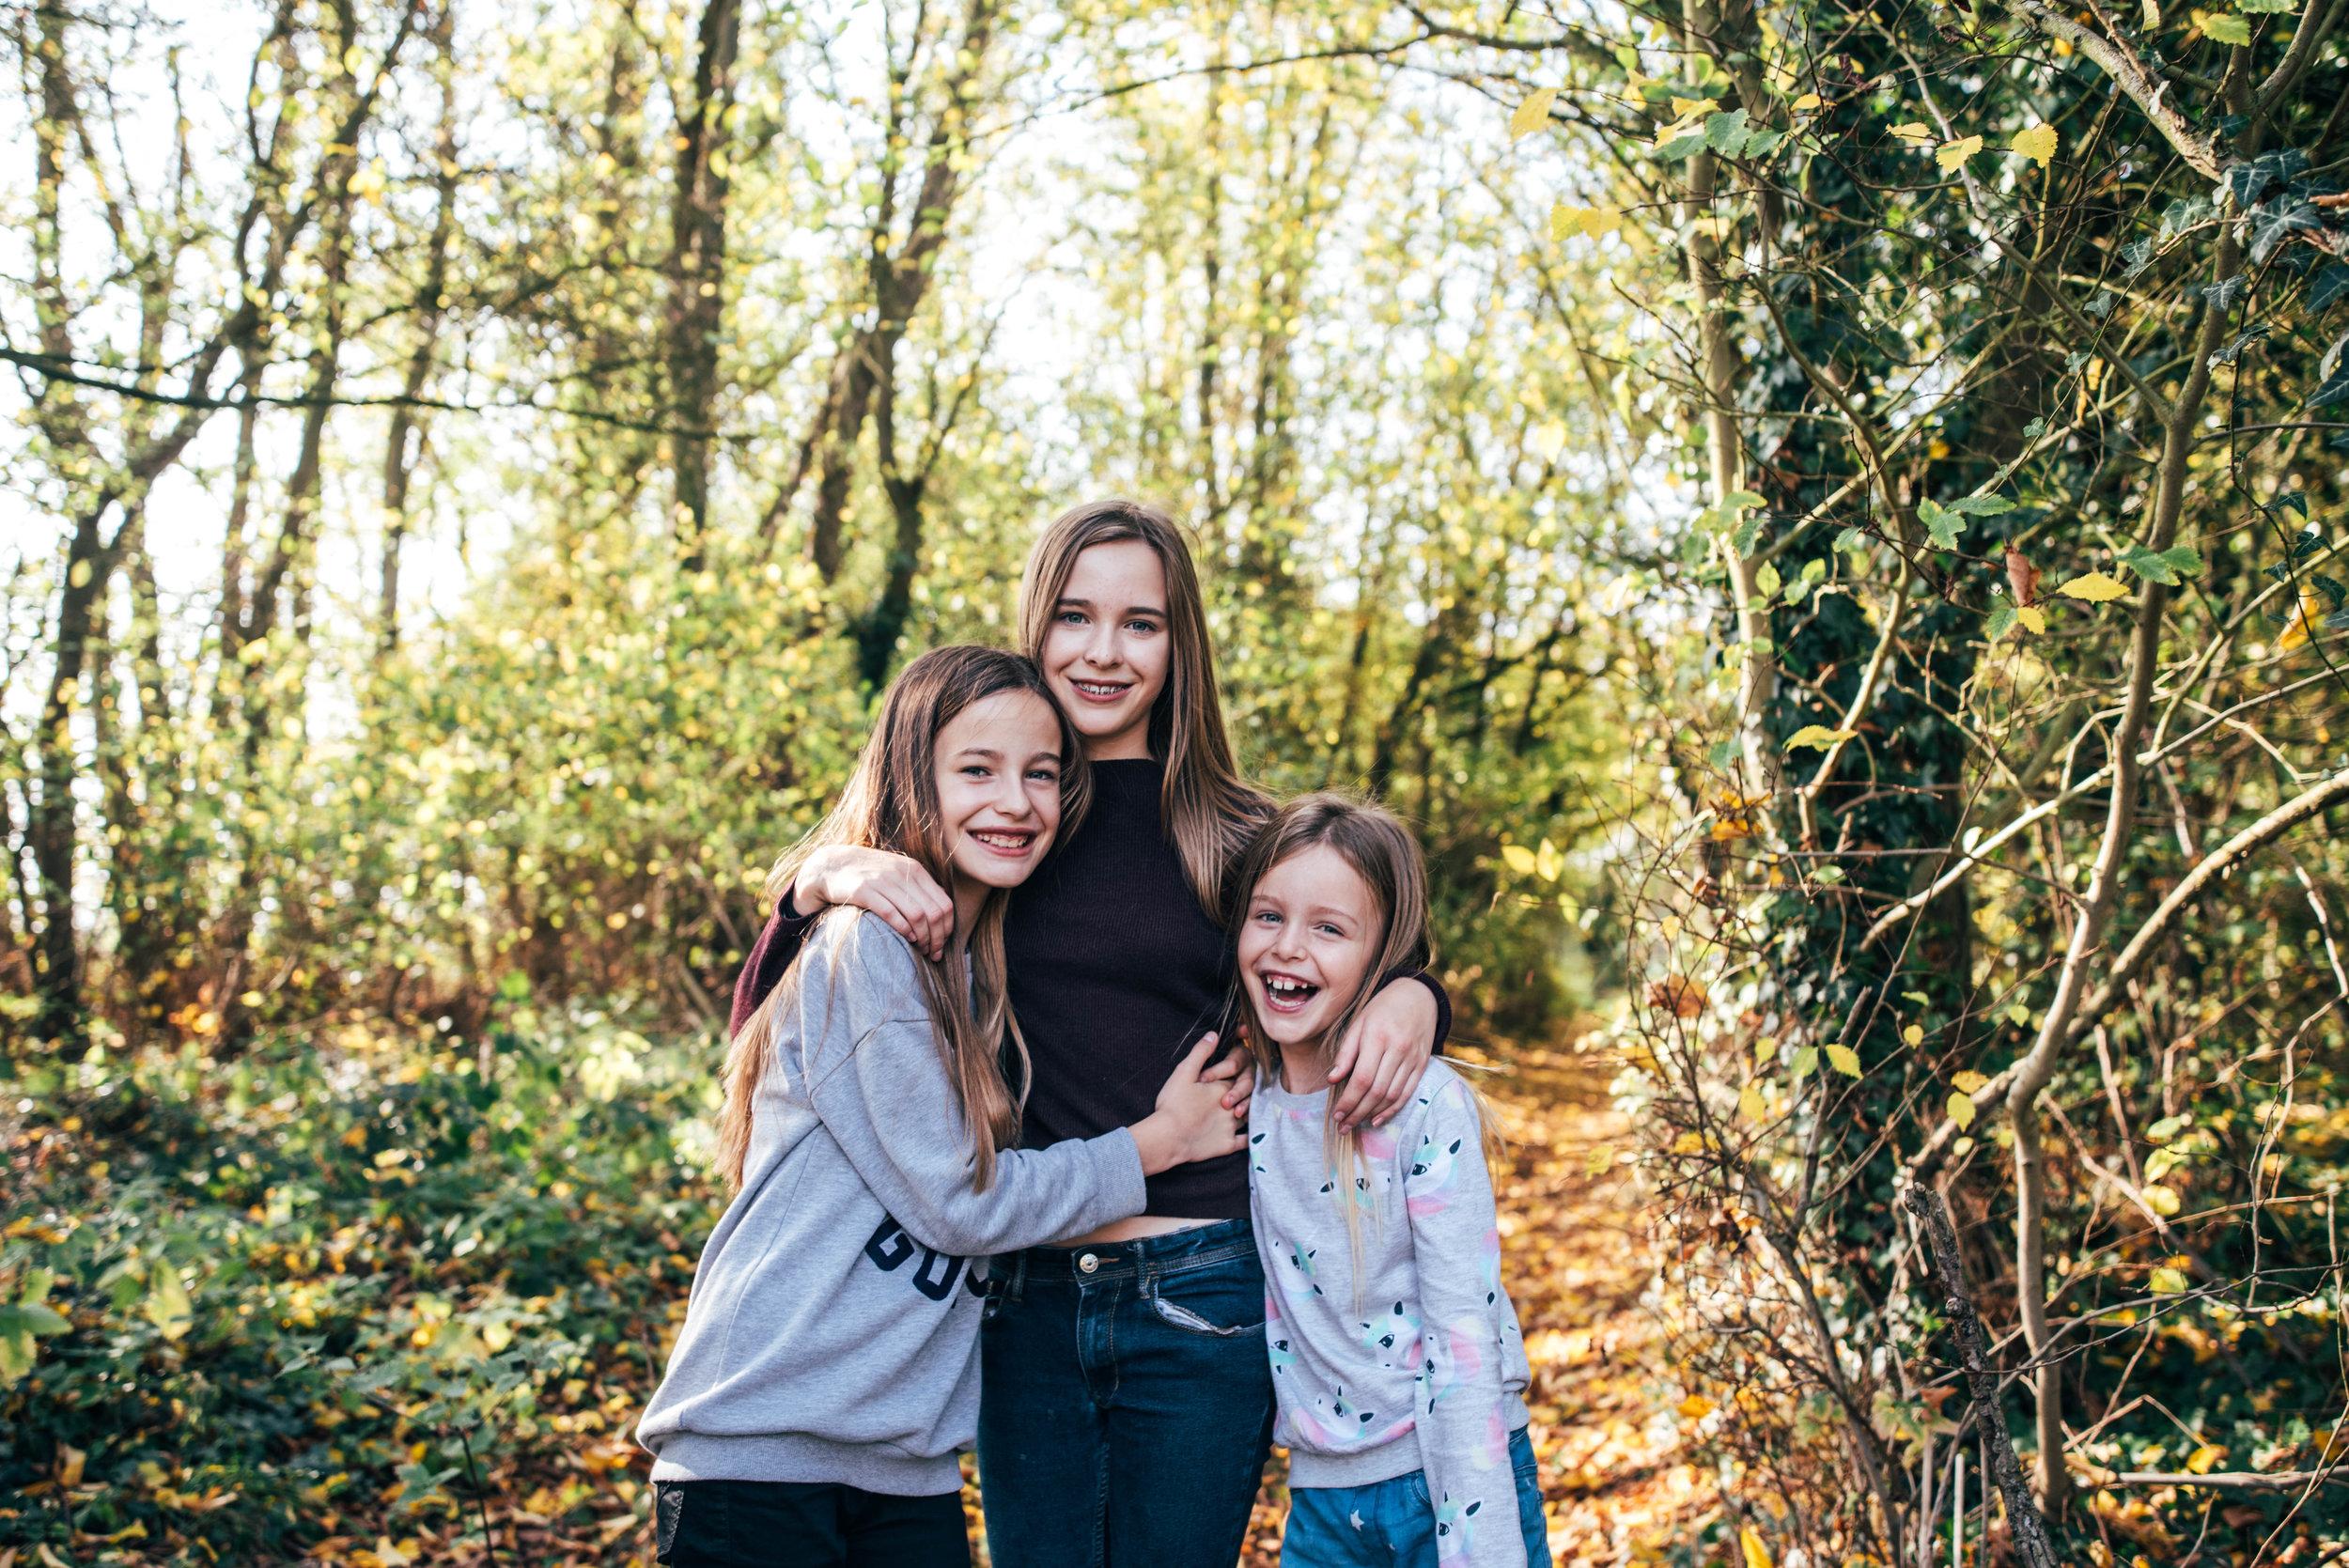 Three Sisters in Autumn Portrait Essex UK Documentary Wedding Photographer